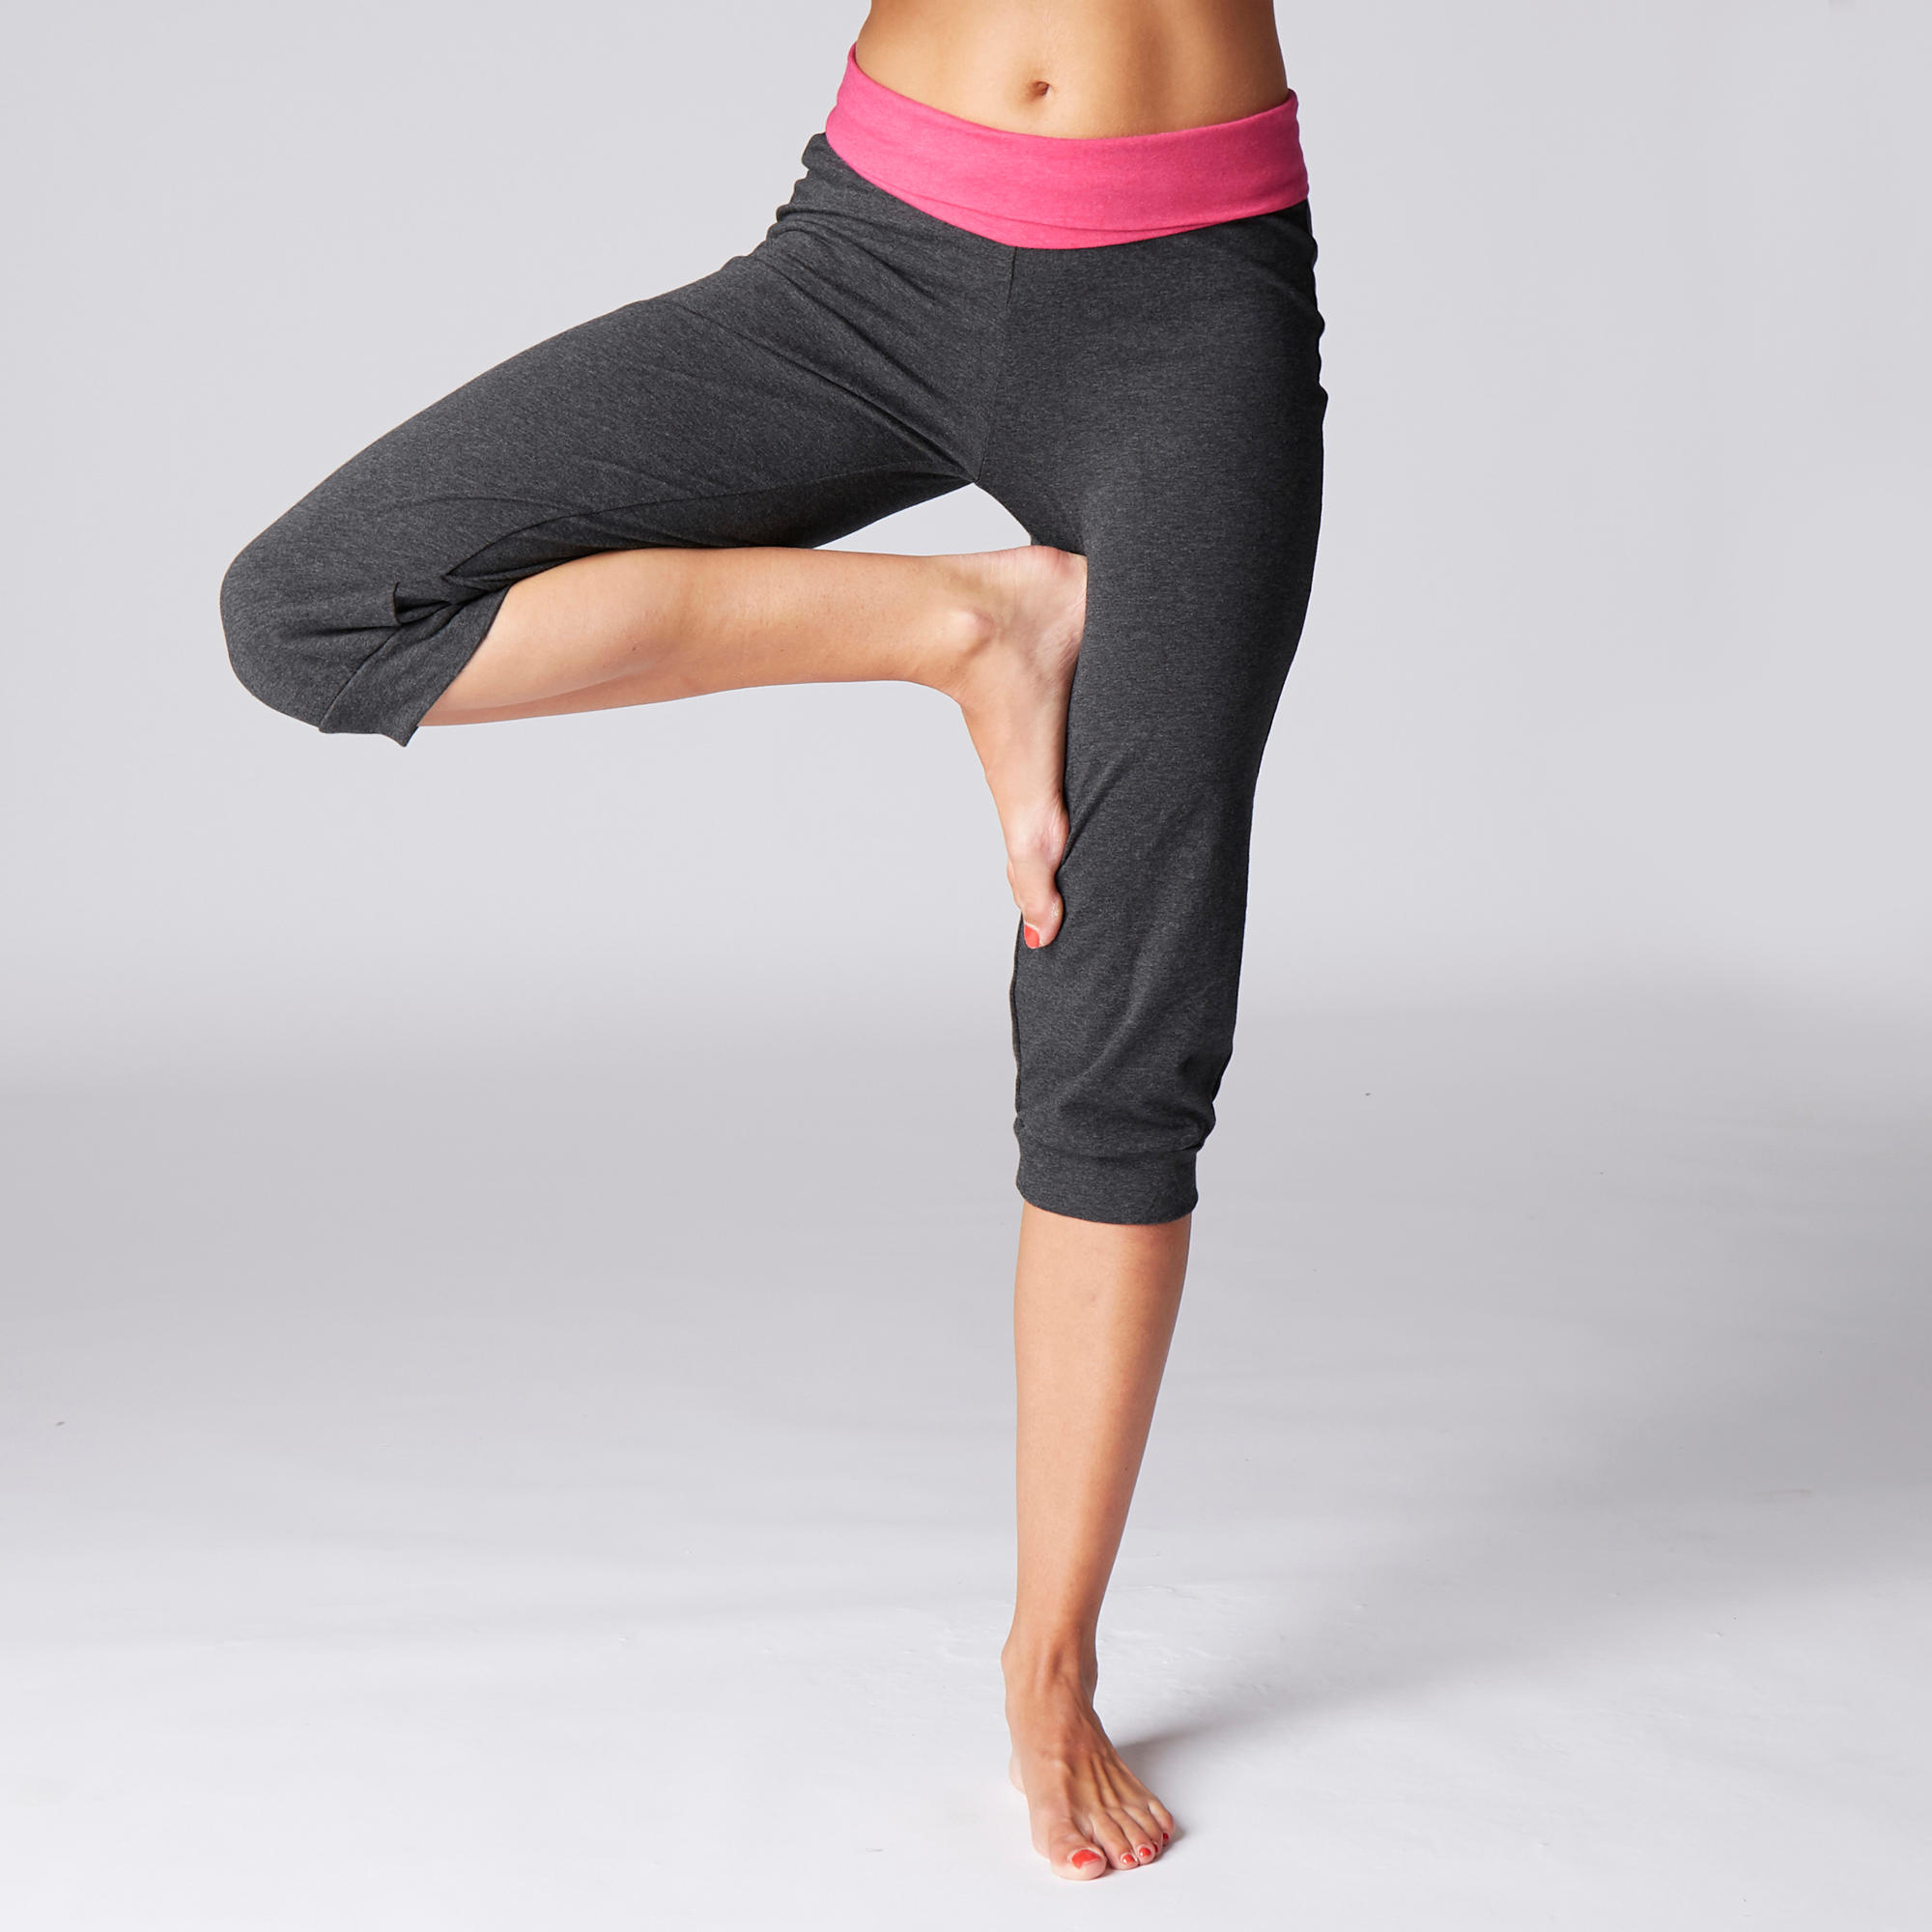 Women's Organic Cotton Gentle Yoga Cropped Bottoms - Grey/Pink